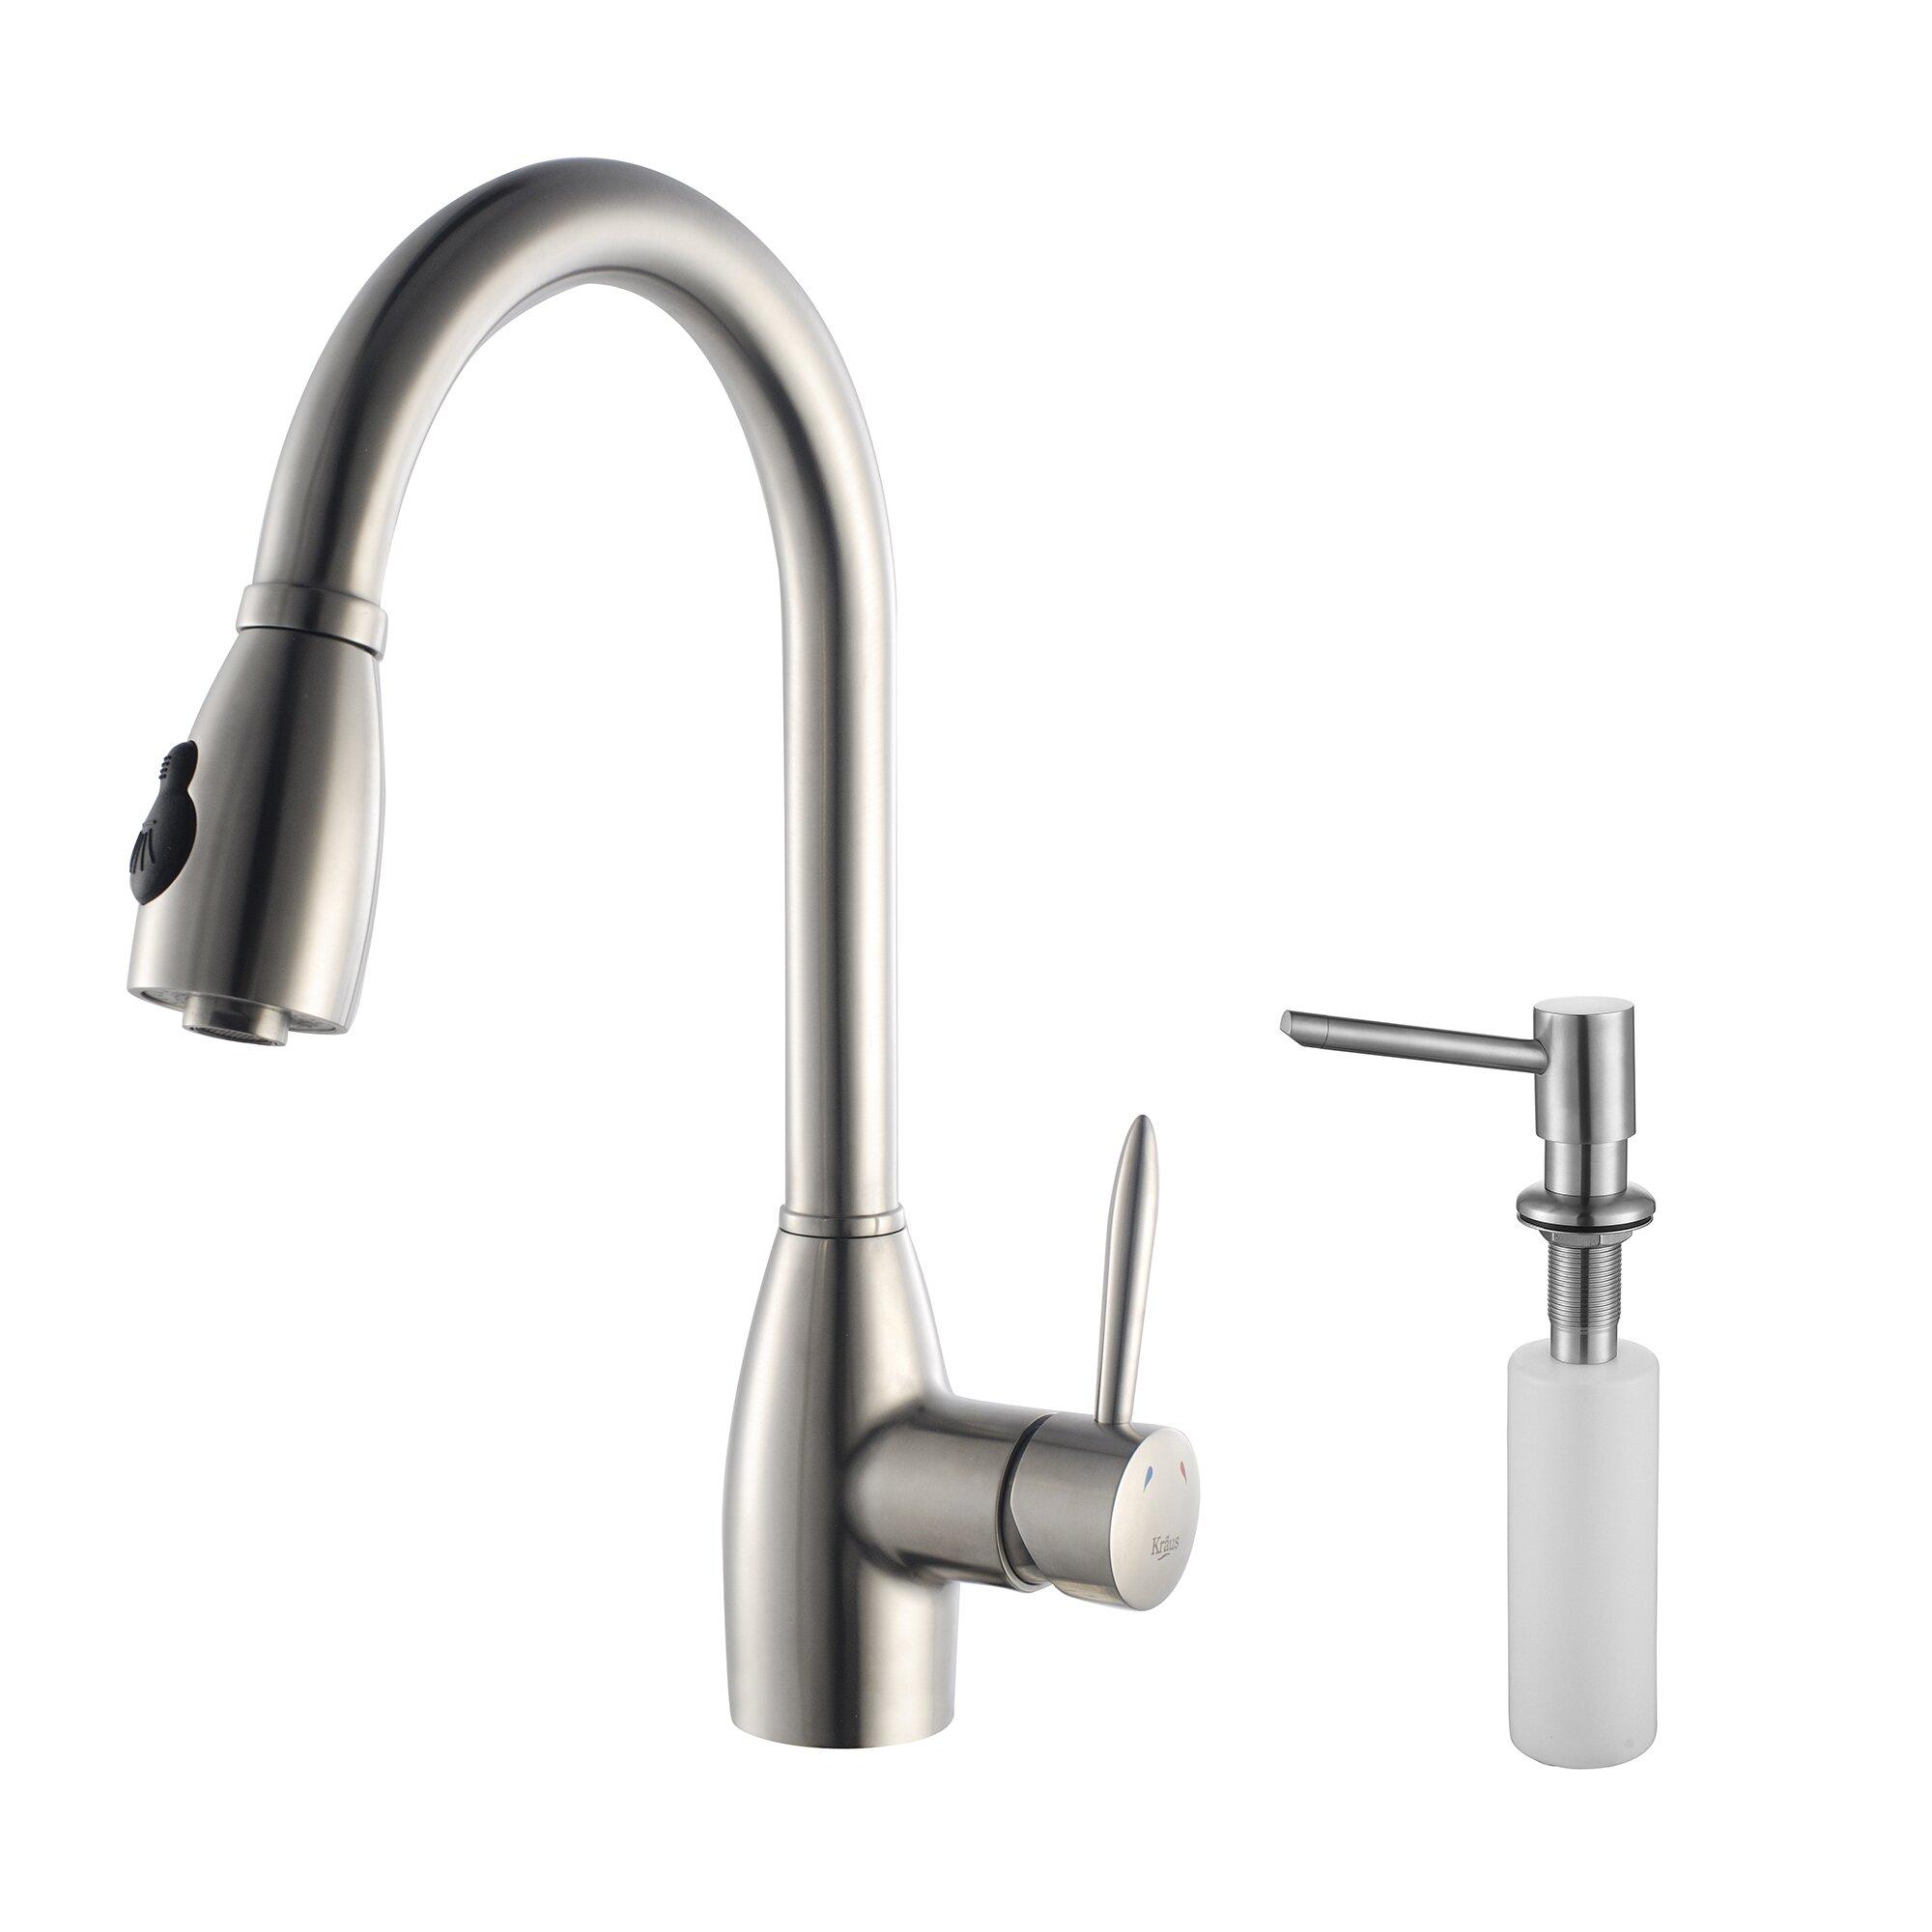 single hole kitchen faucet chef single hole kitchen faucet with kitchen faucet with separate handle kraus single handle single hole kitchen faucet amp reviews